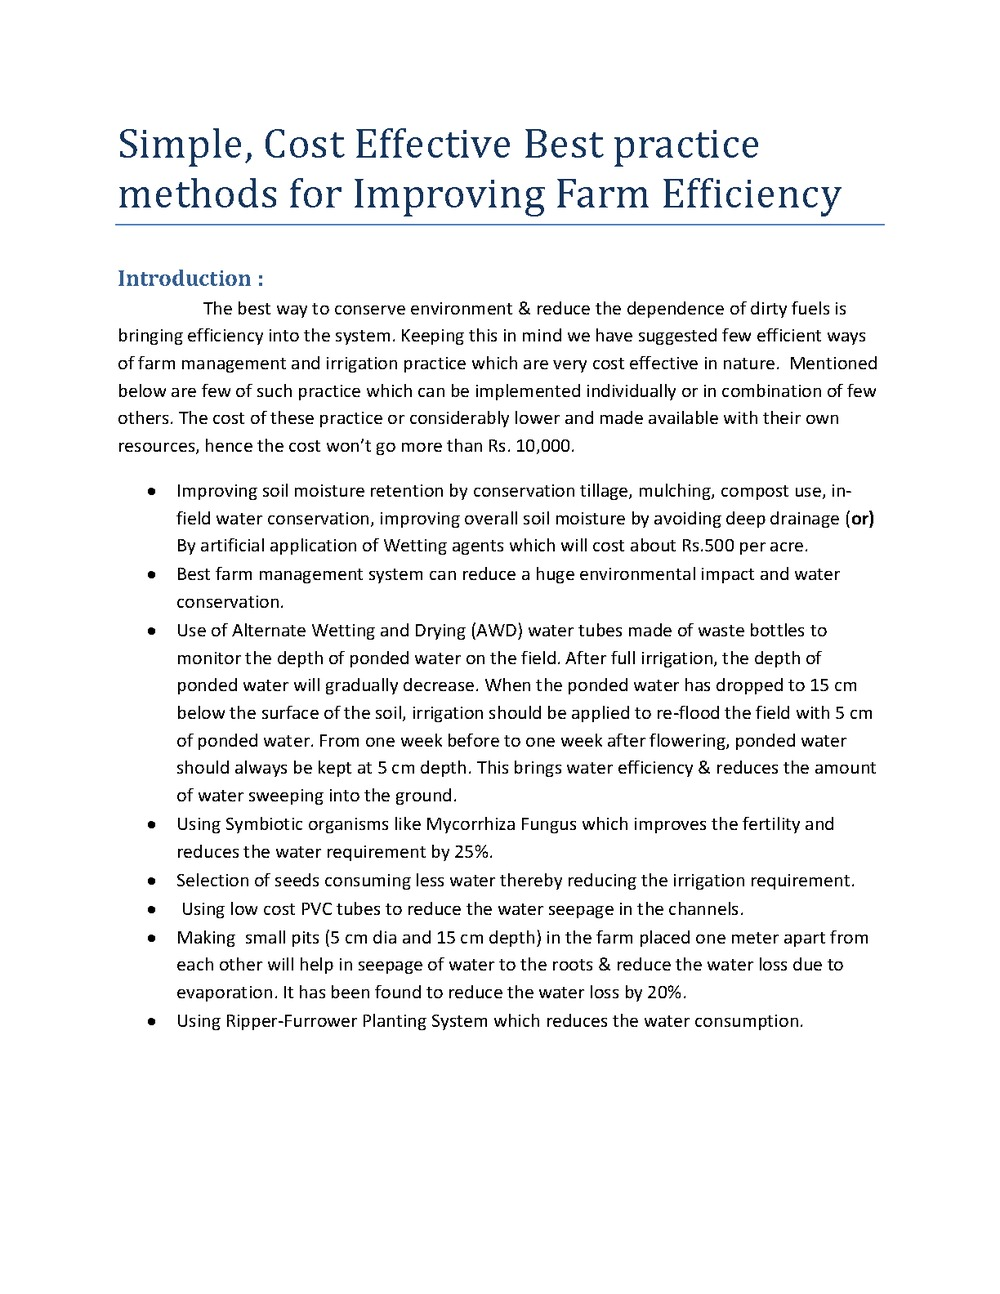 Simple cost effective best practice methods for reducing water consumption bigger